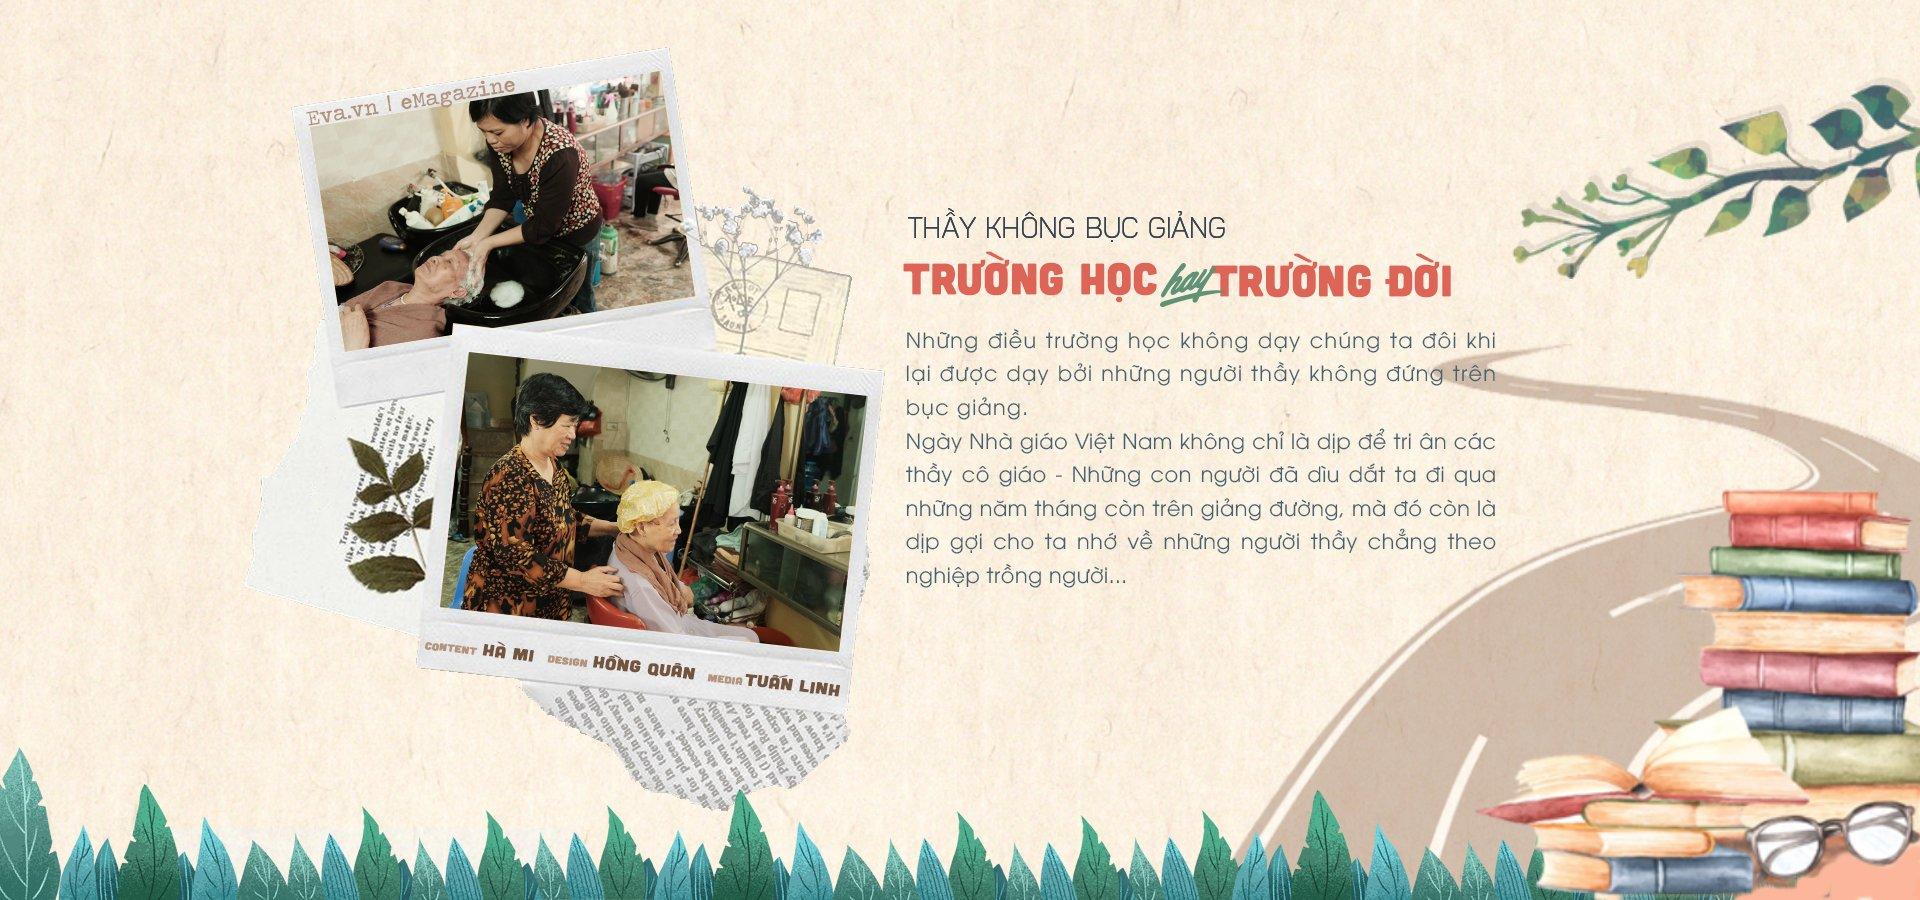 "co chu tiem toc khong qua ngay 20/11: nho nhat dua hoc tro vua nang khieu lai them ""mau lieu"" - 15"